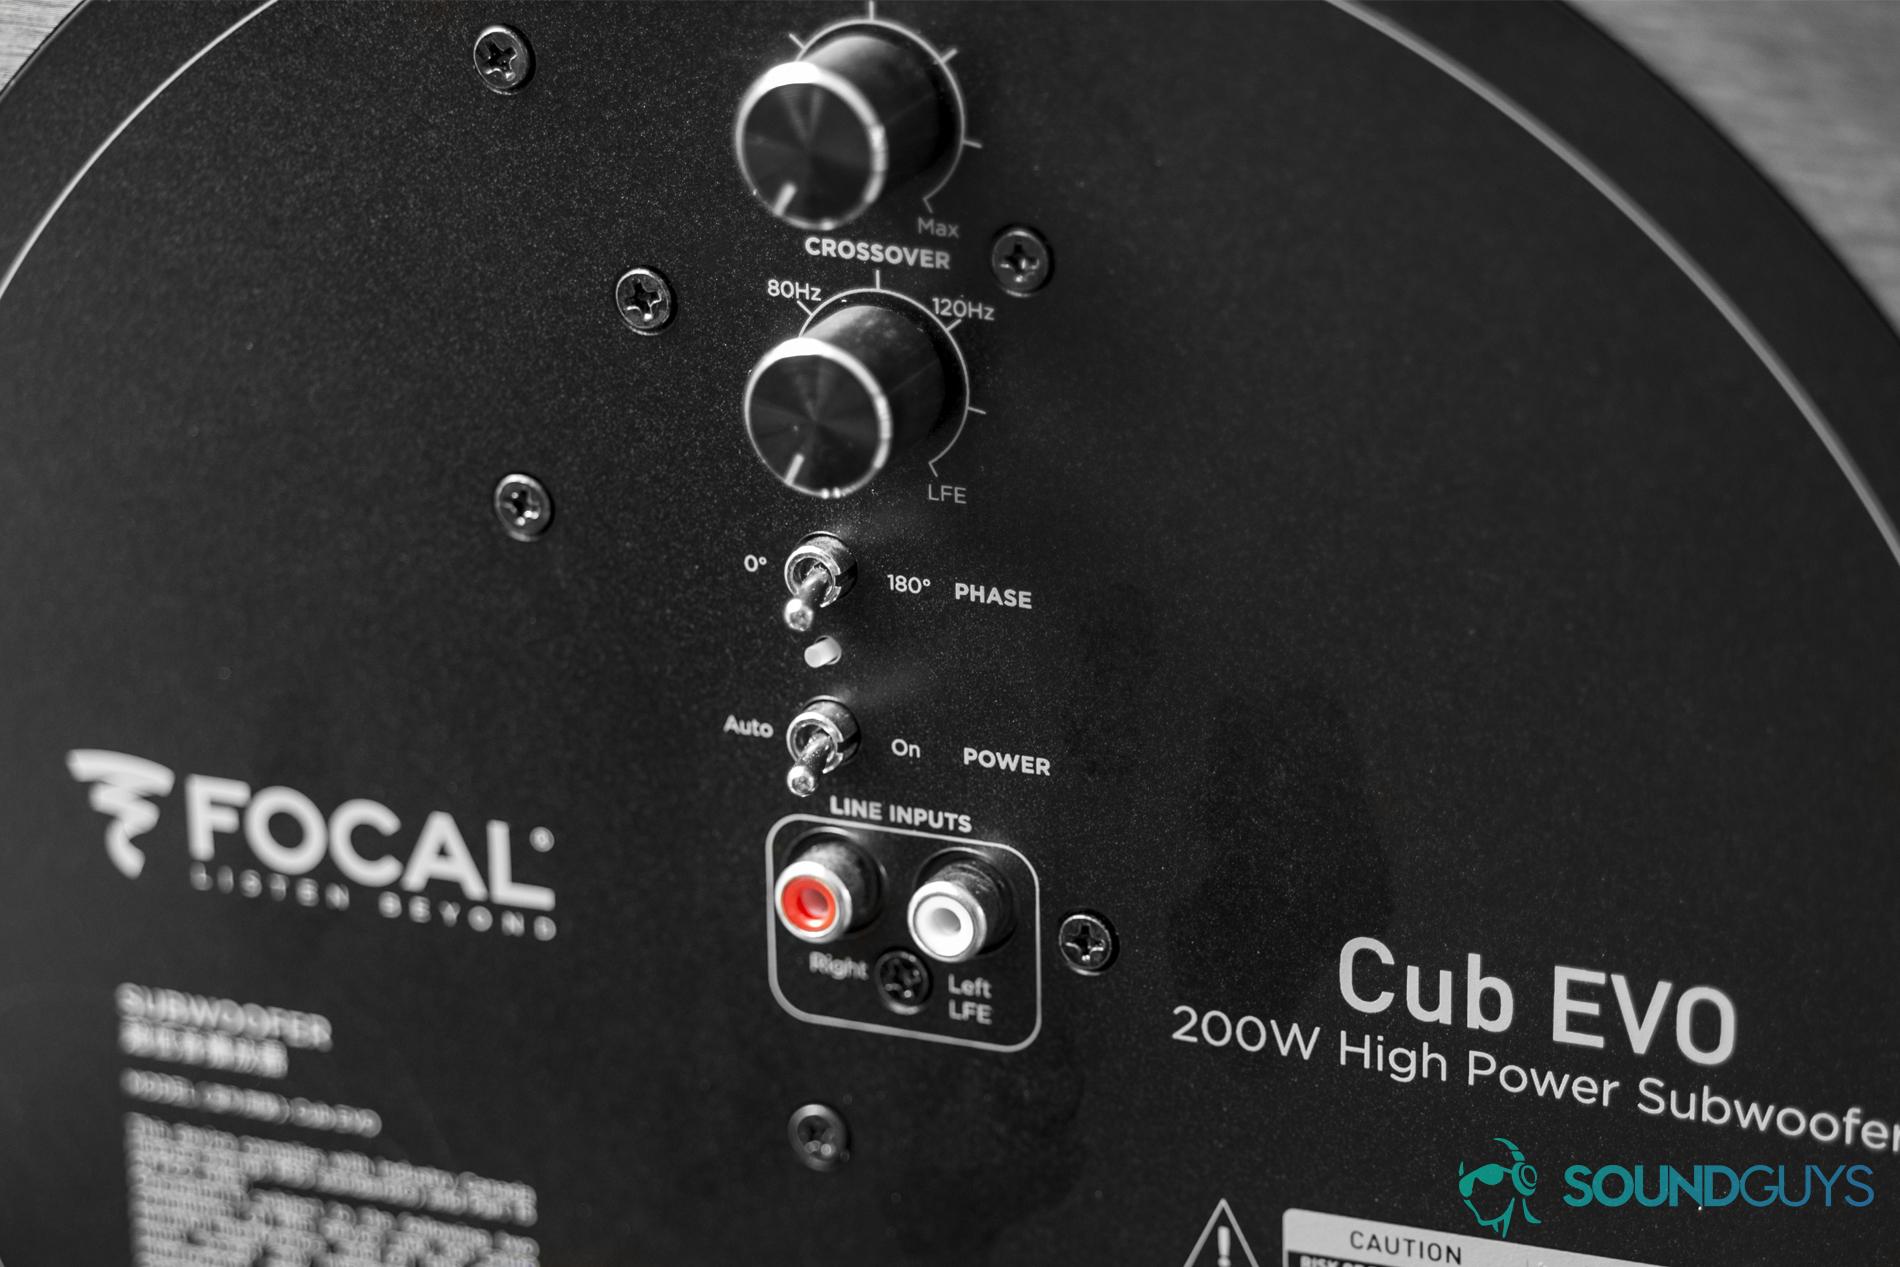 Focal Sib Evo Dolby Atmos 5 1 2 review - SoundGuys